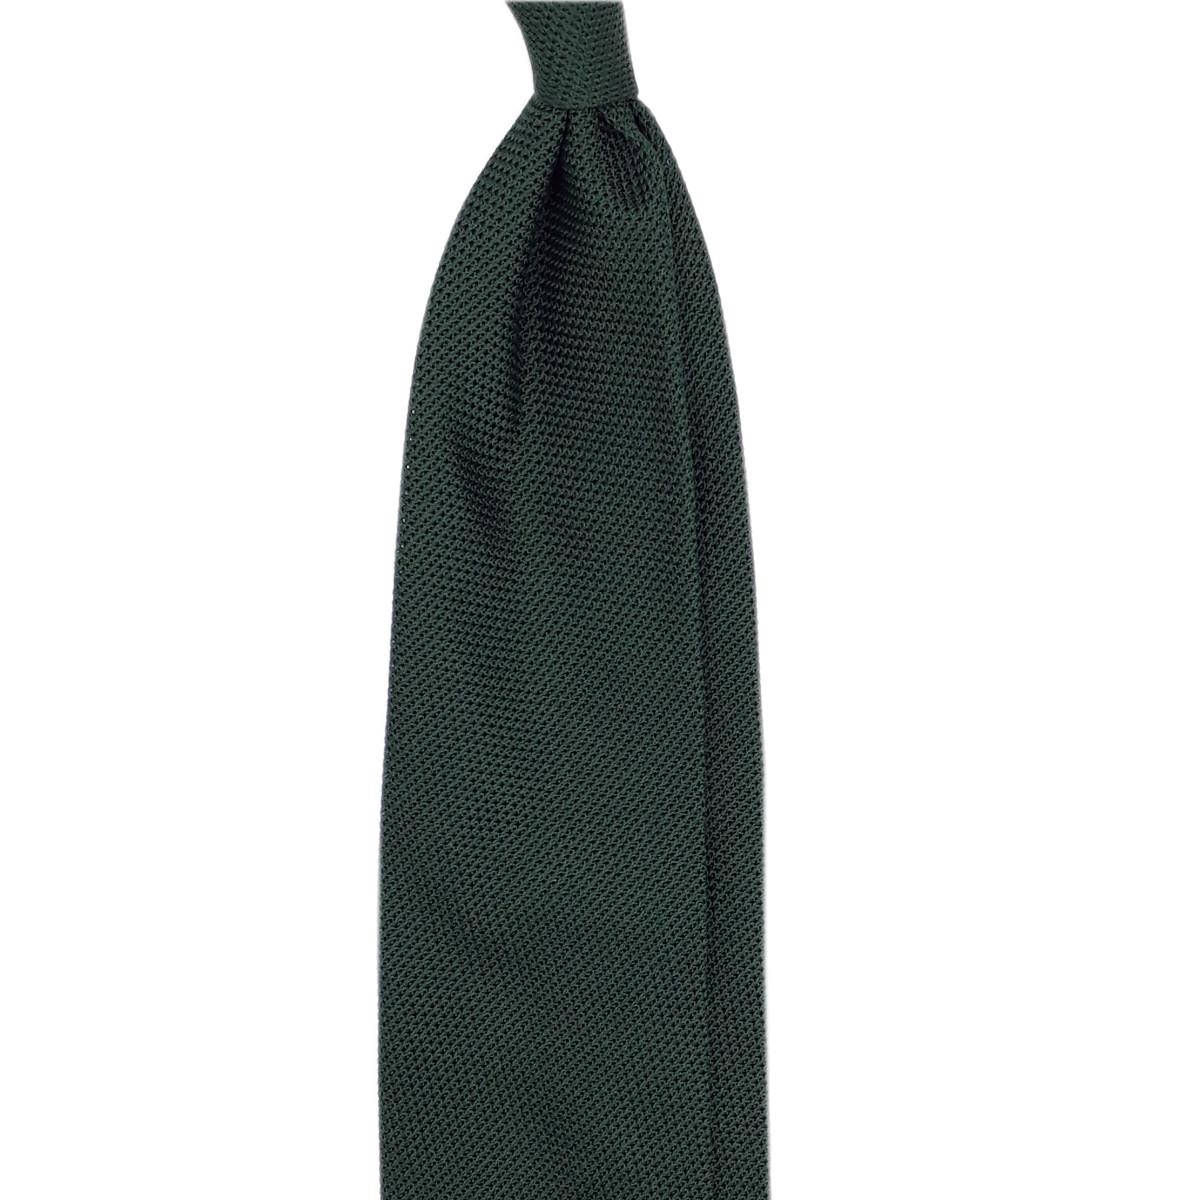 Cravate en grenadine de soie vert forêt